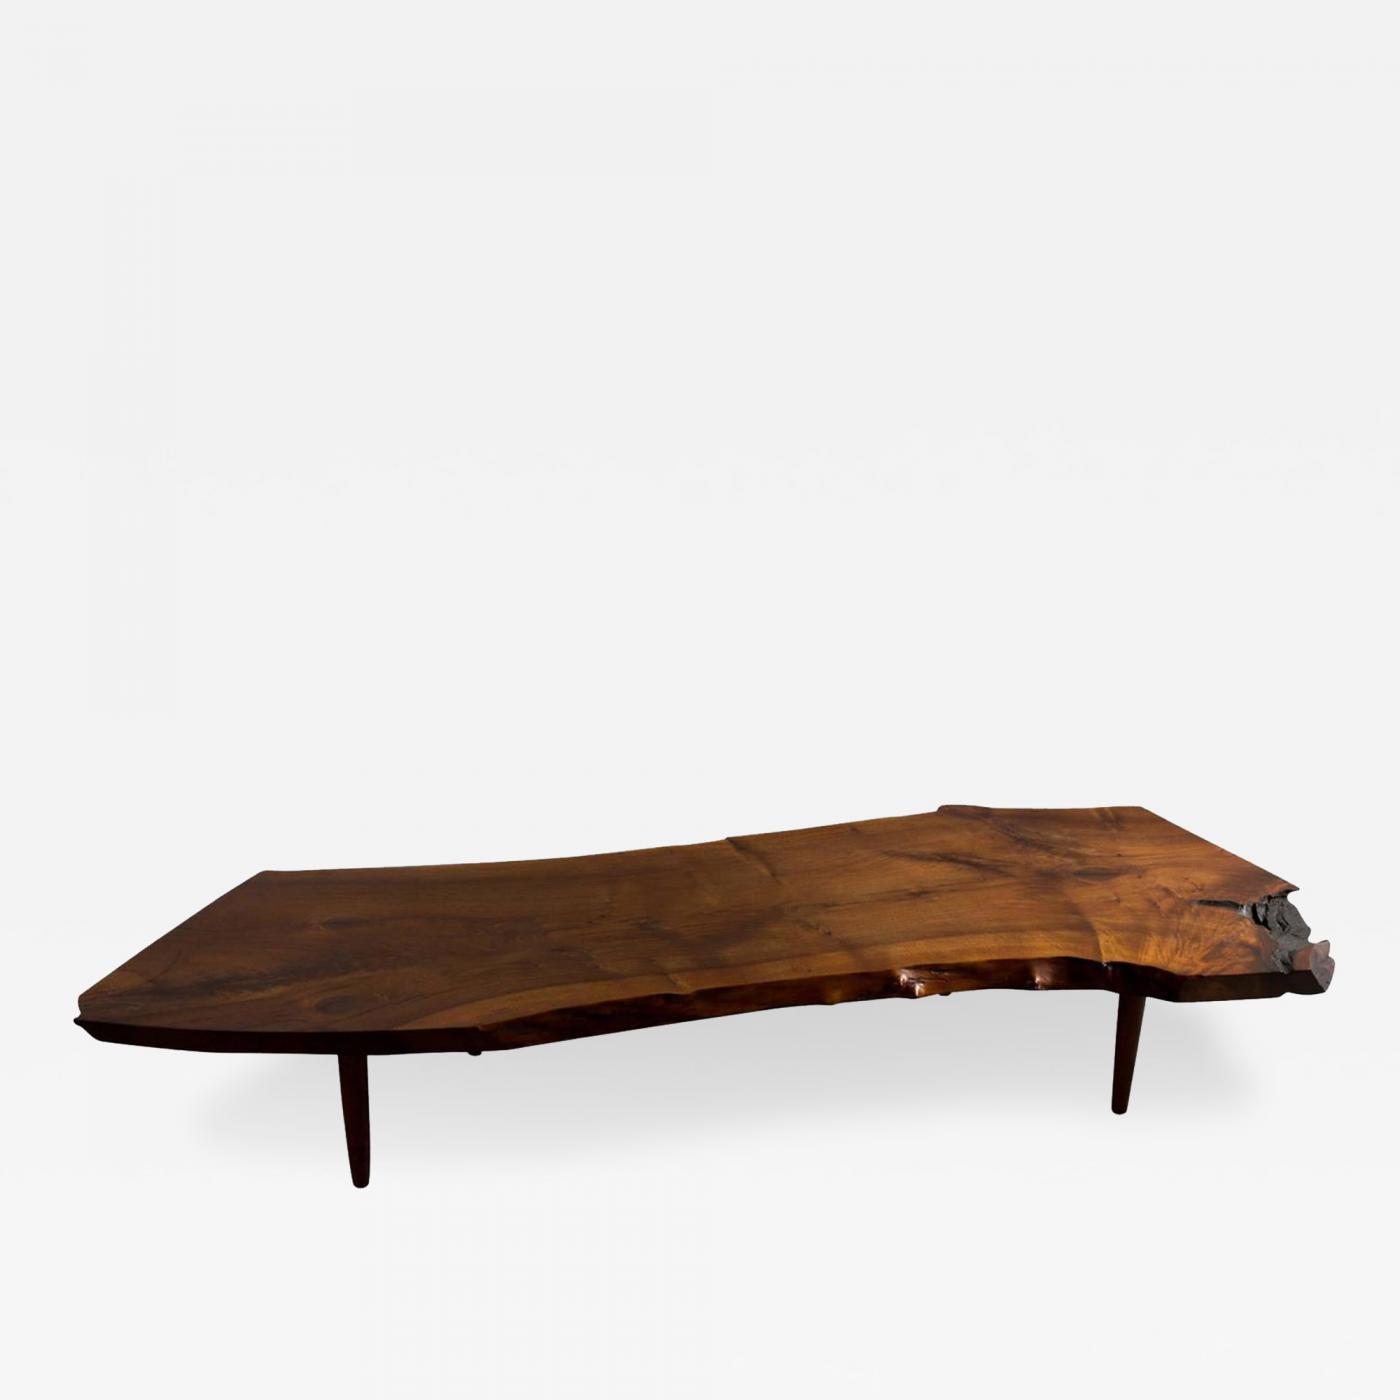 george nakashima george nakashima coffee table in walnut